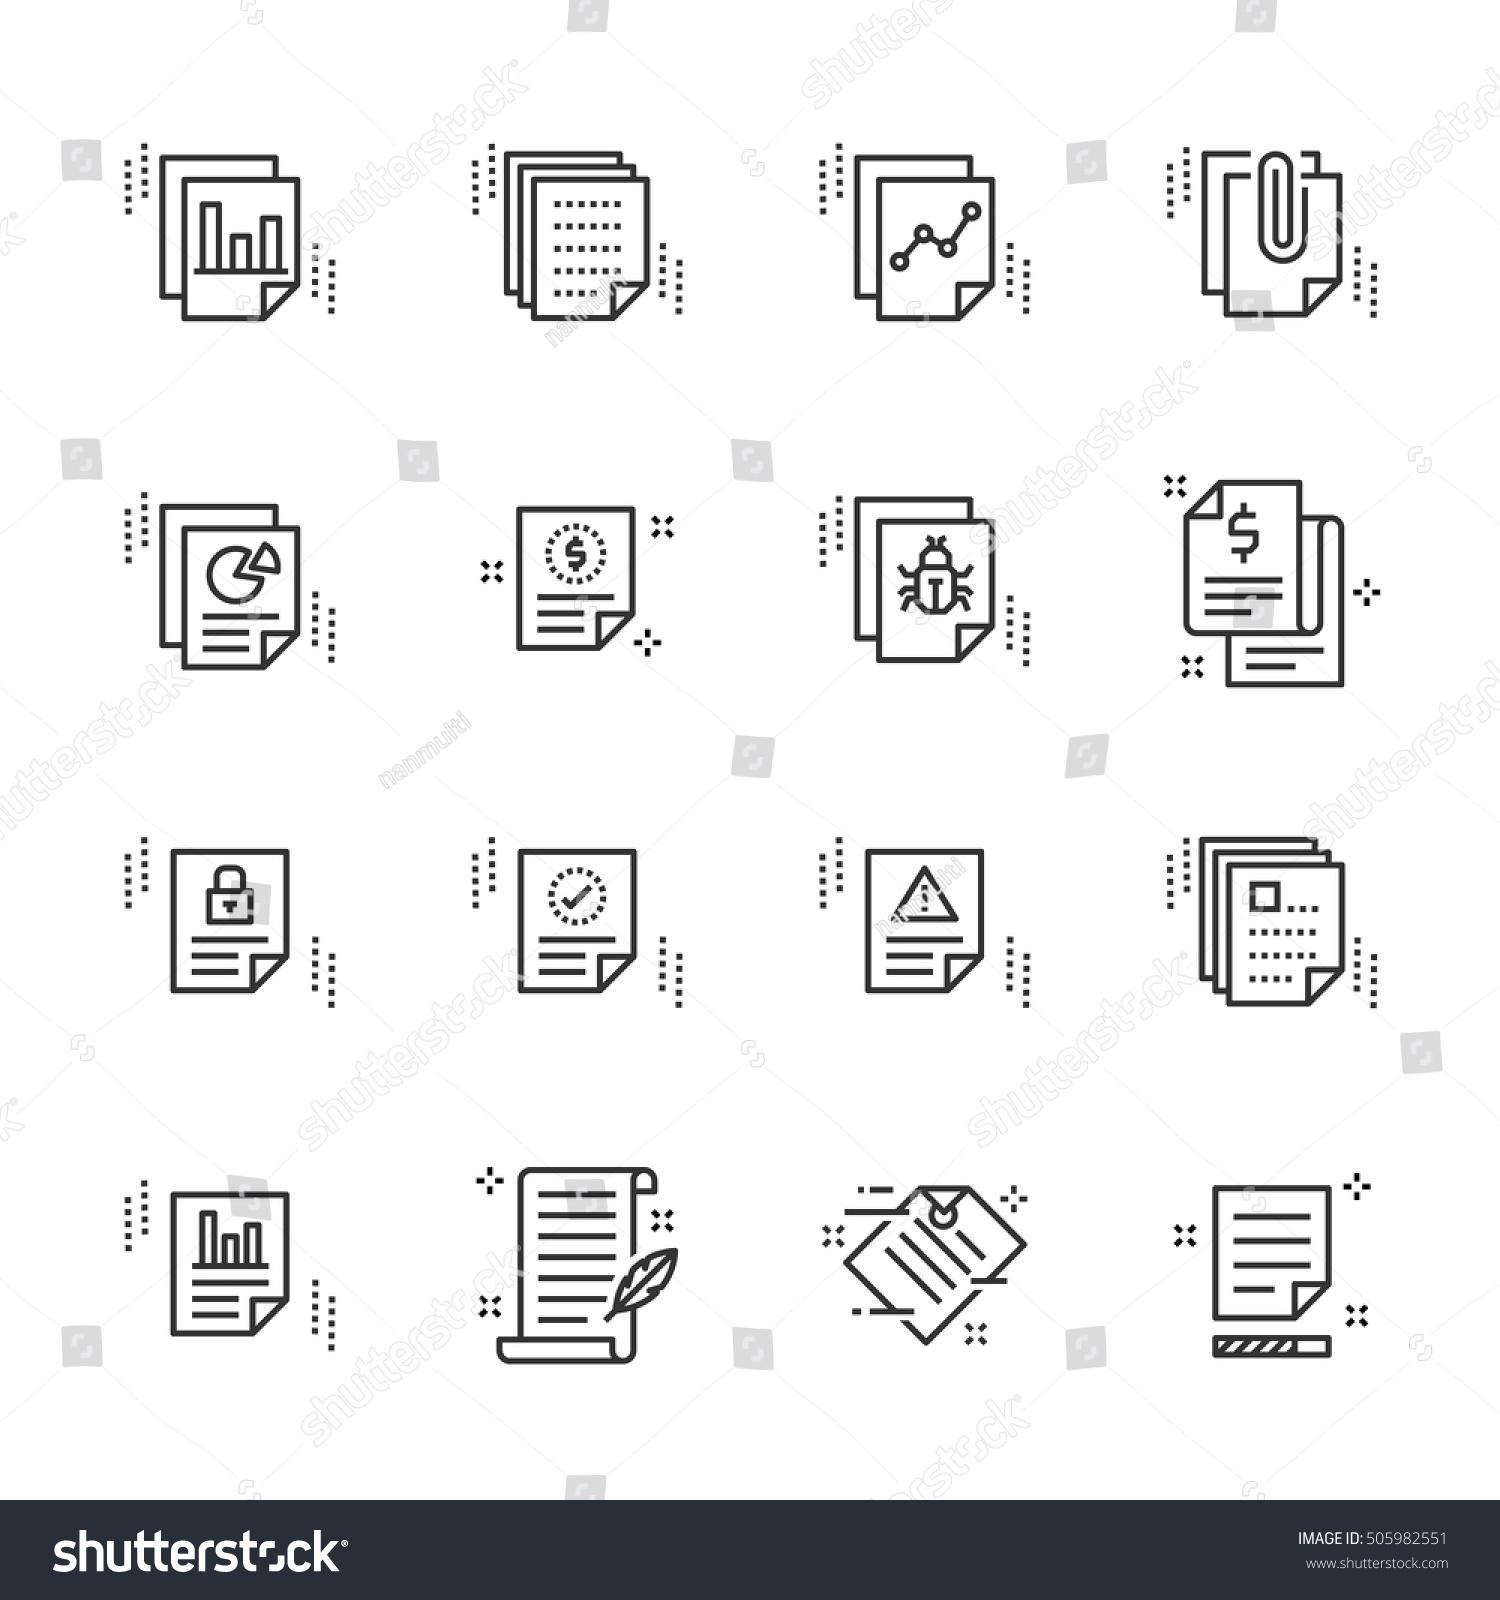 Report Related Simple Vector Line Icons Stock-vektorgrafik 505982551 ...